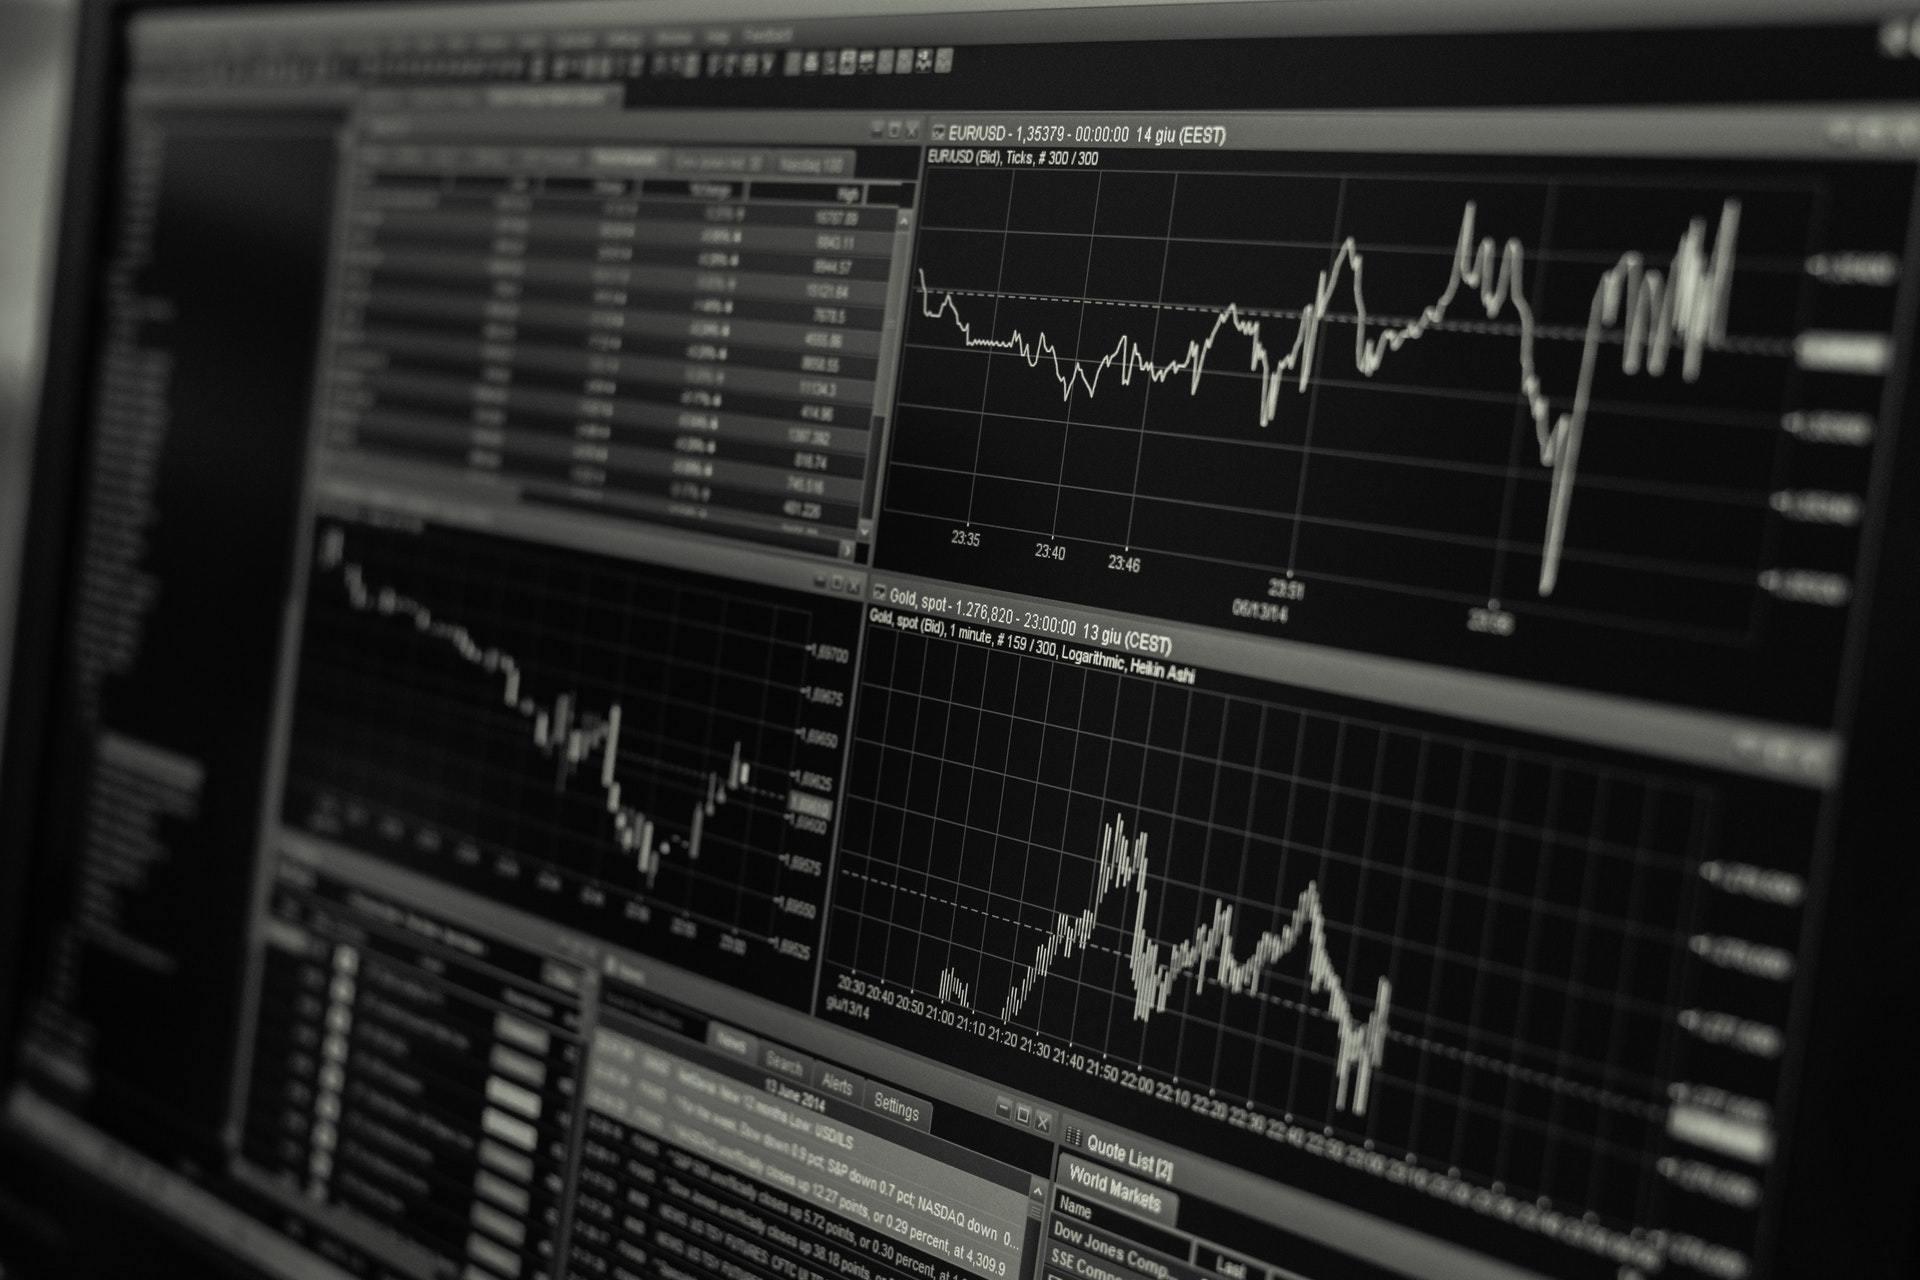 P2P Lending and ETF Portfolio